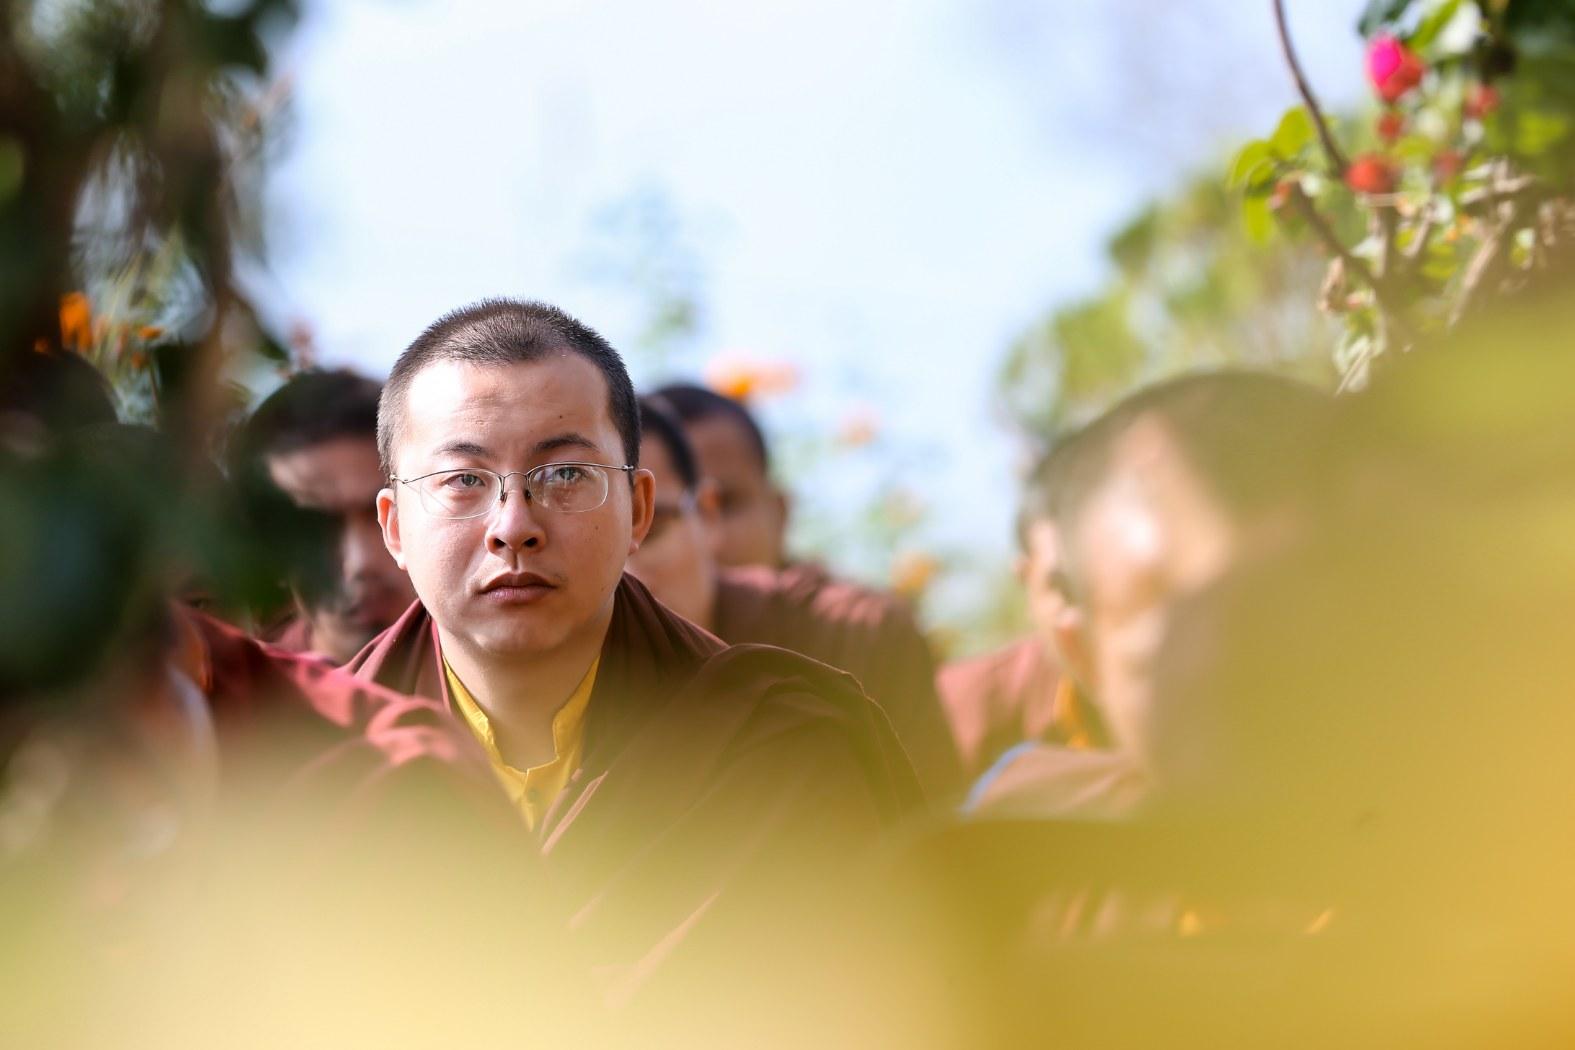 jigme_rinpoche_klp18-10_1575x1050